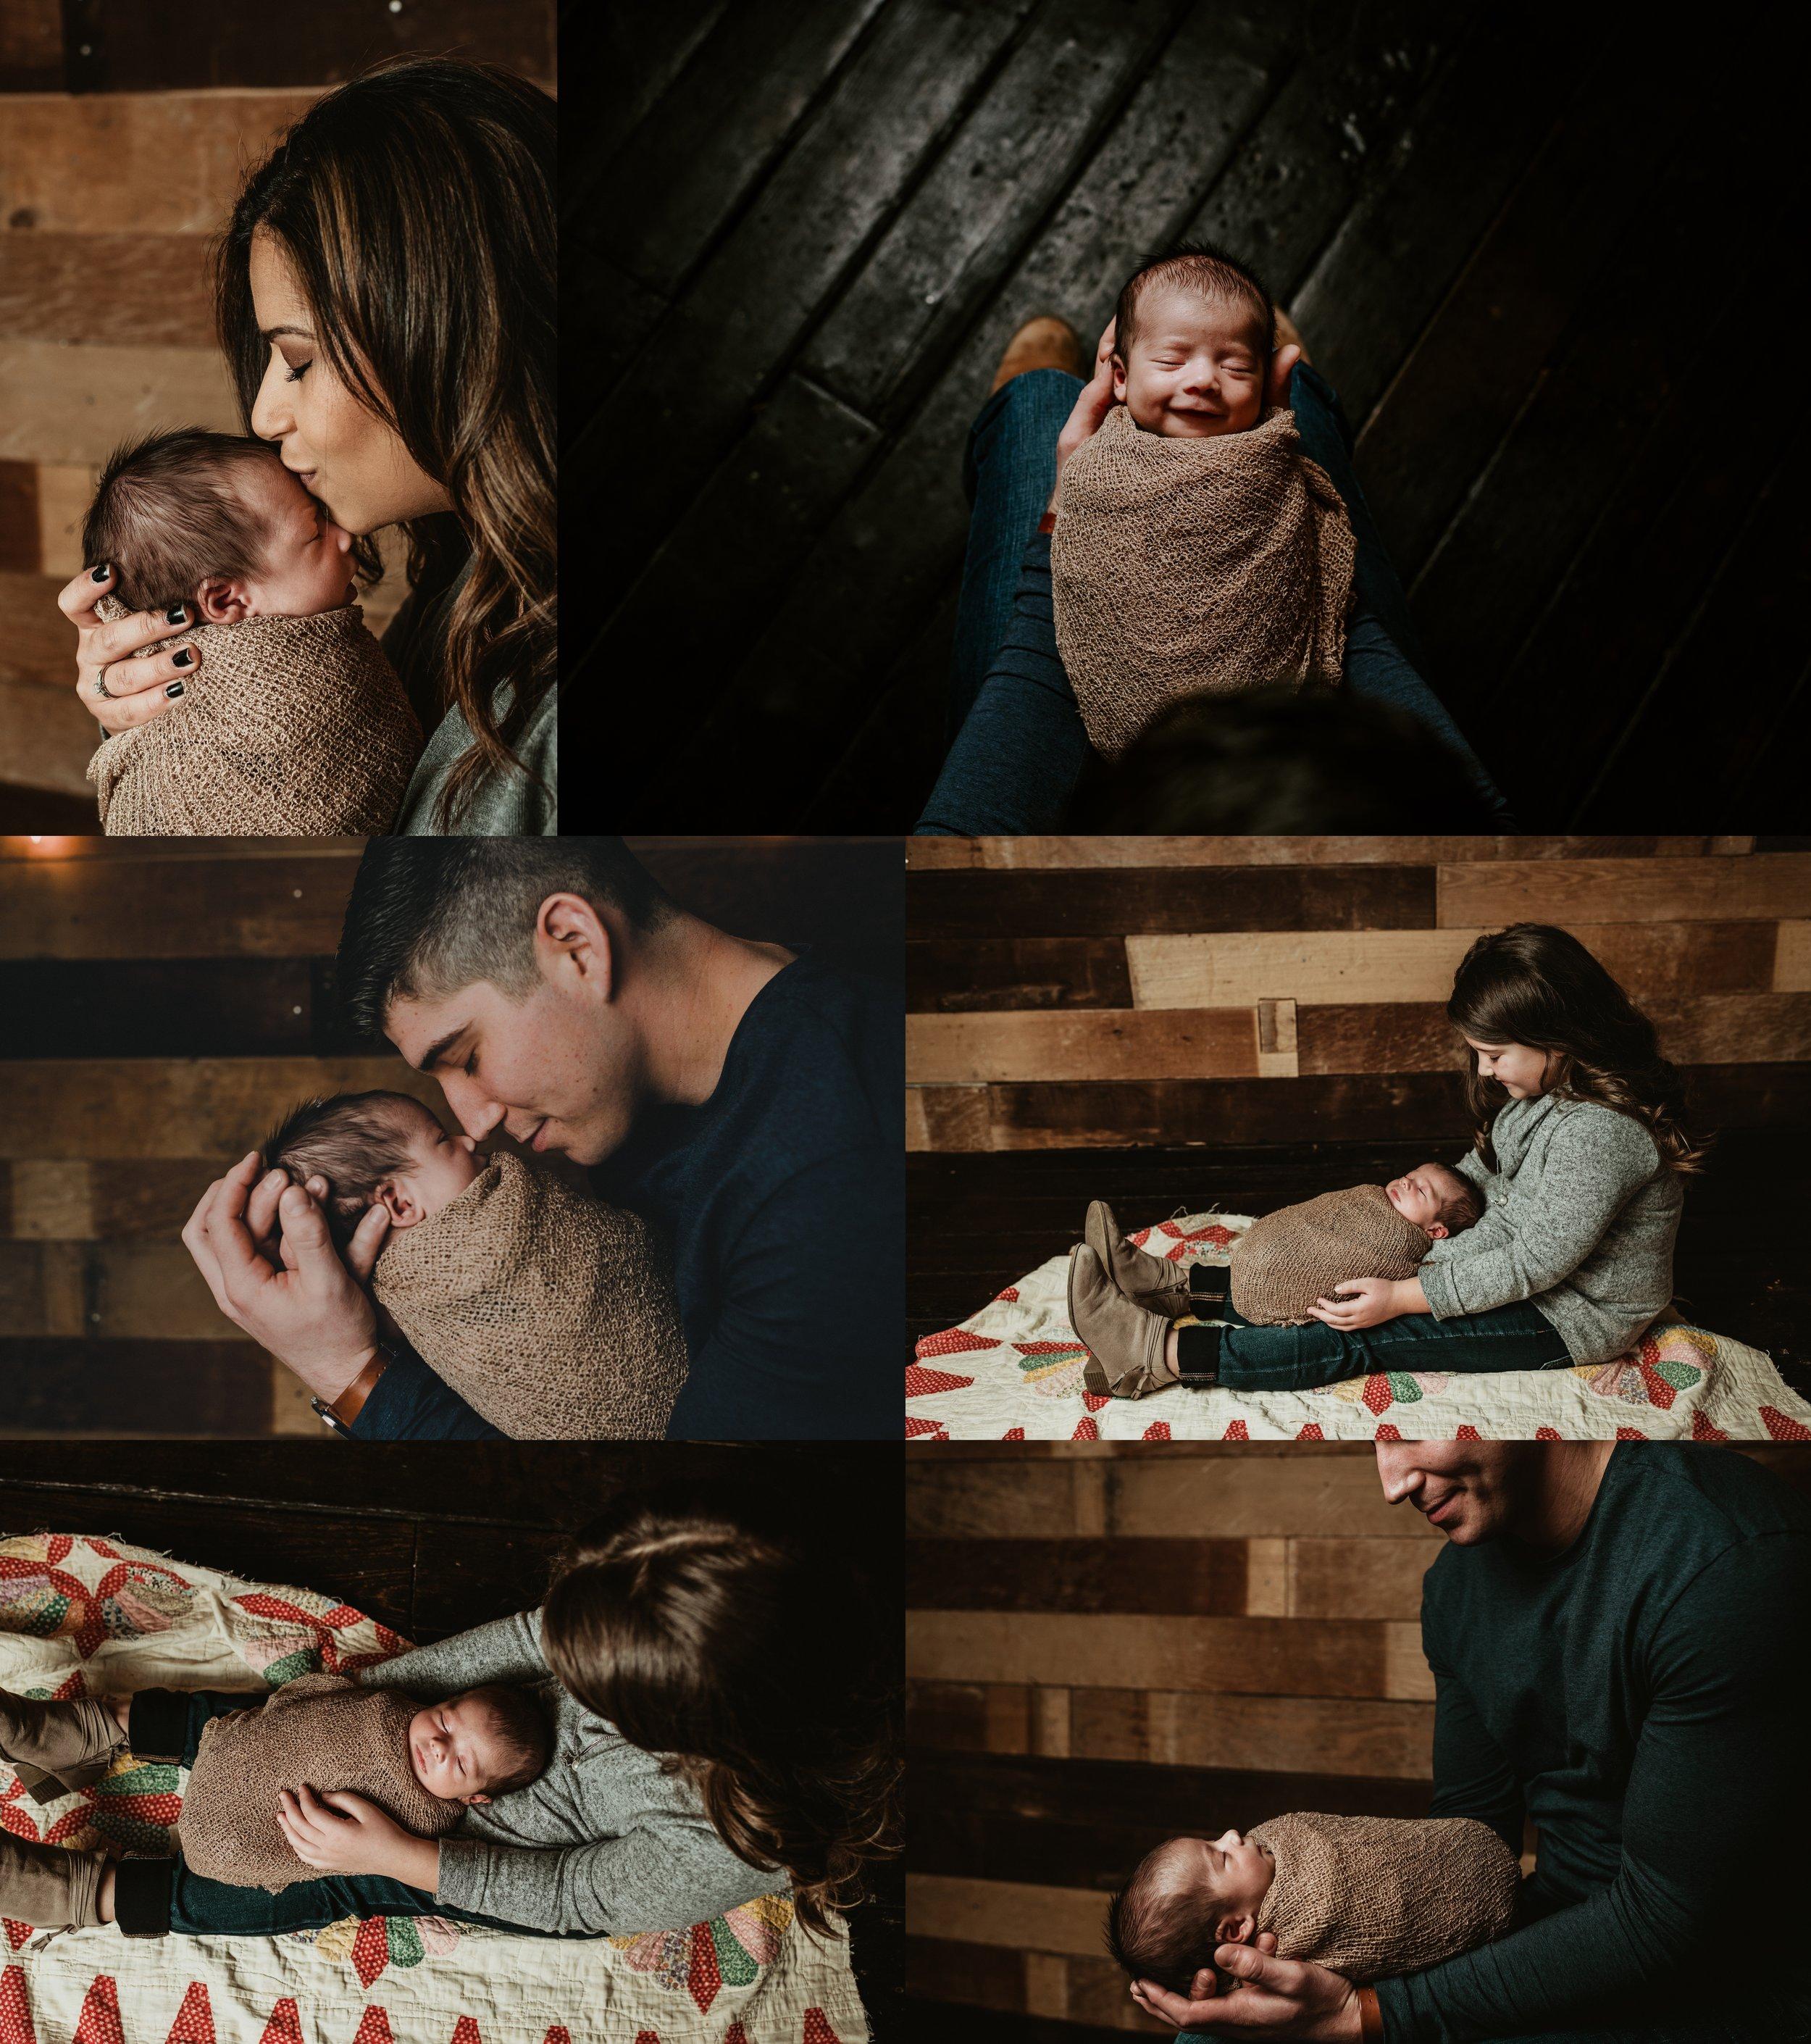 Rustic Newborn Photo Session | Baby Boy | Farmhouse Newborn Studio Session | Family Photos | Barn wood | Terry Farms Photography